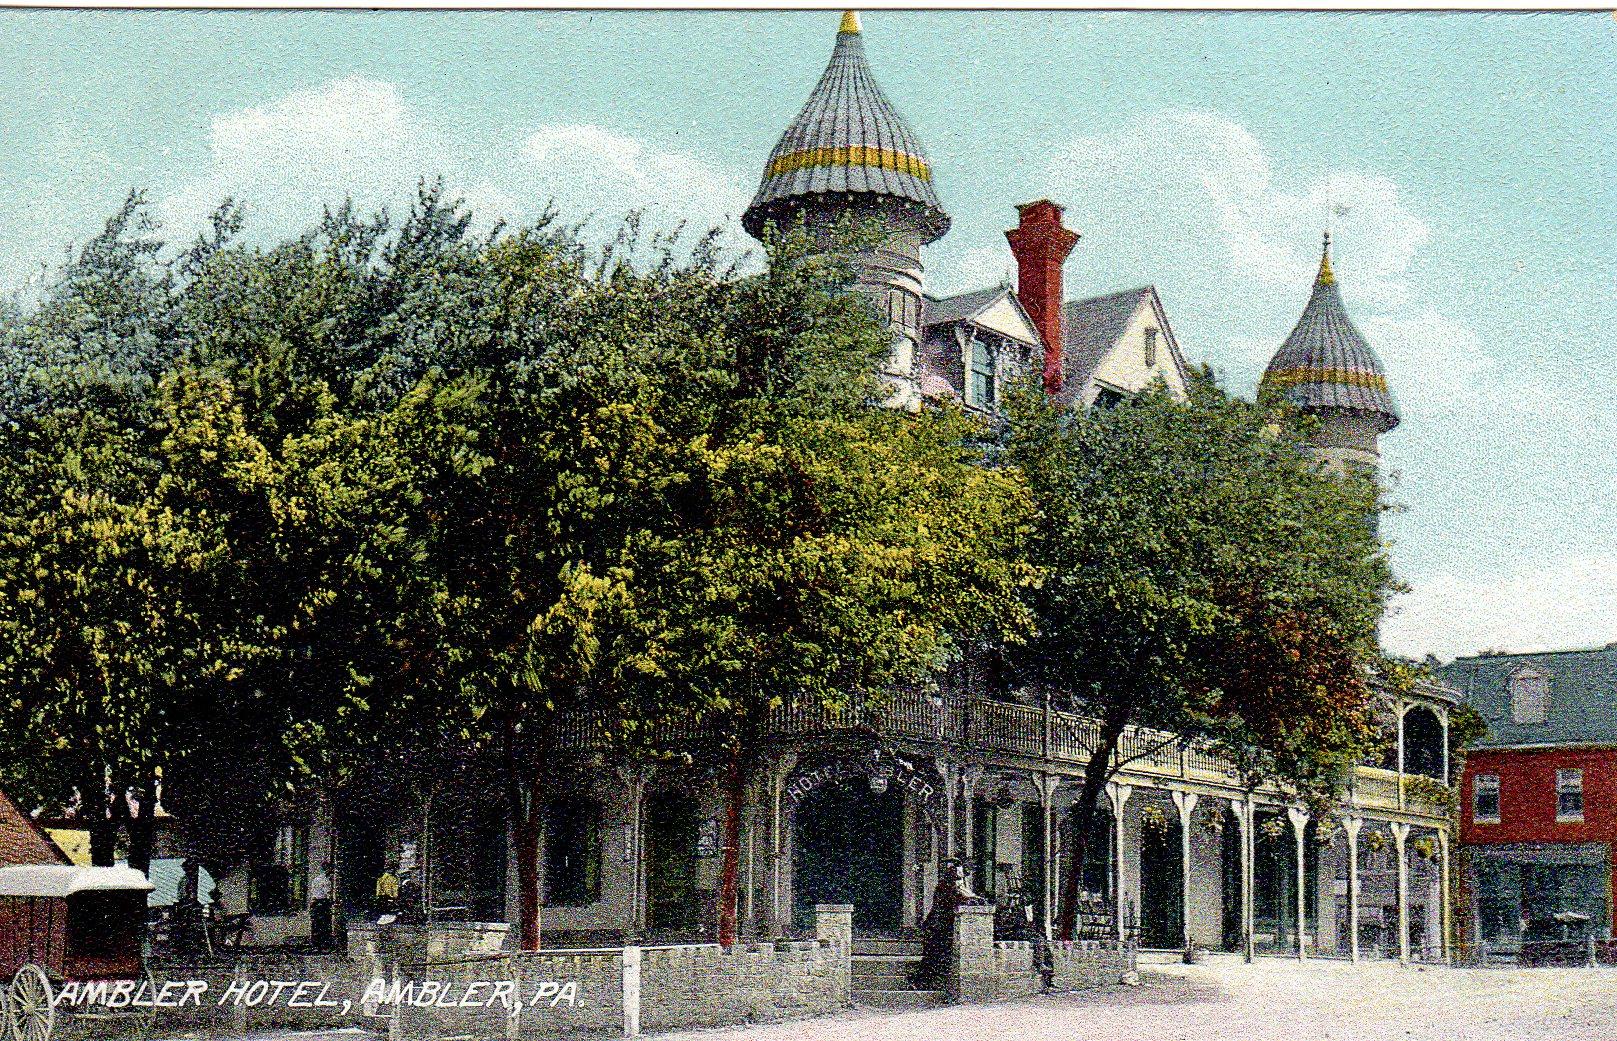 Post Card Collection (E Simon)_2682_16_Ambler Hotel, Ambler, Pa